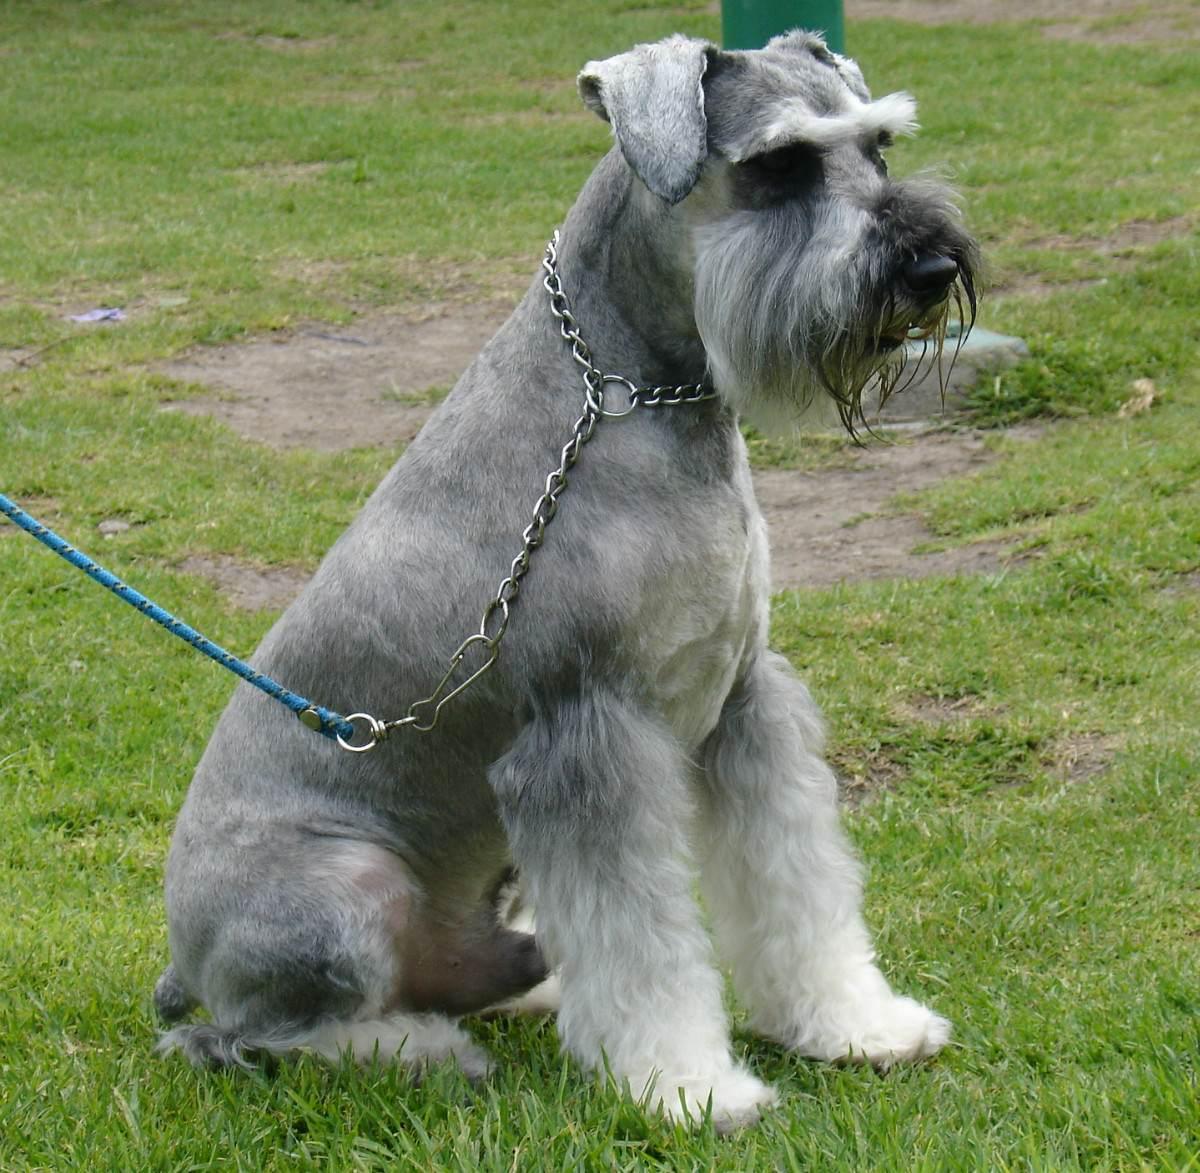 Saint Cute Puppy Hd Wallpaper Sitting Schnauzer Standard Dog Photo And Wallpaper